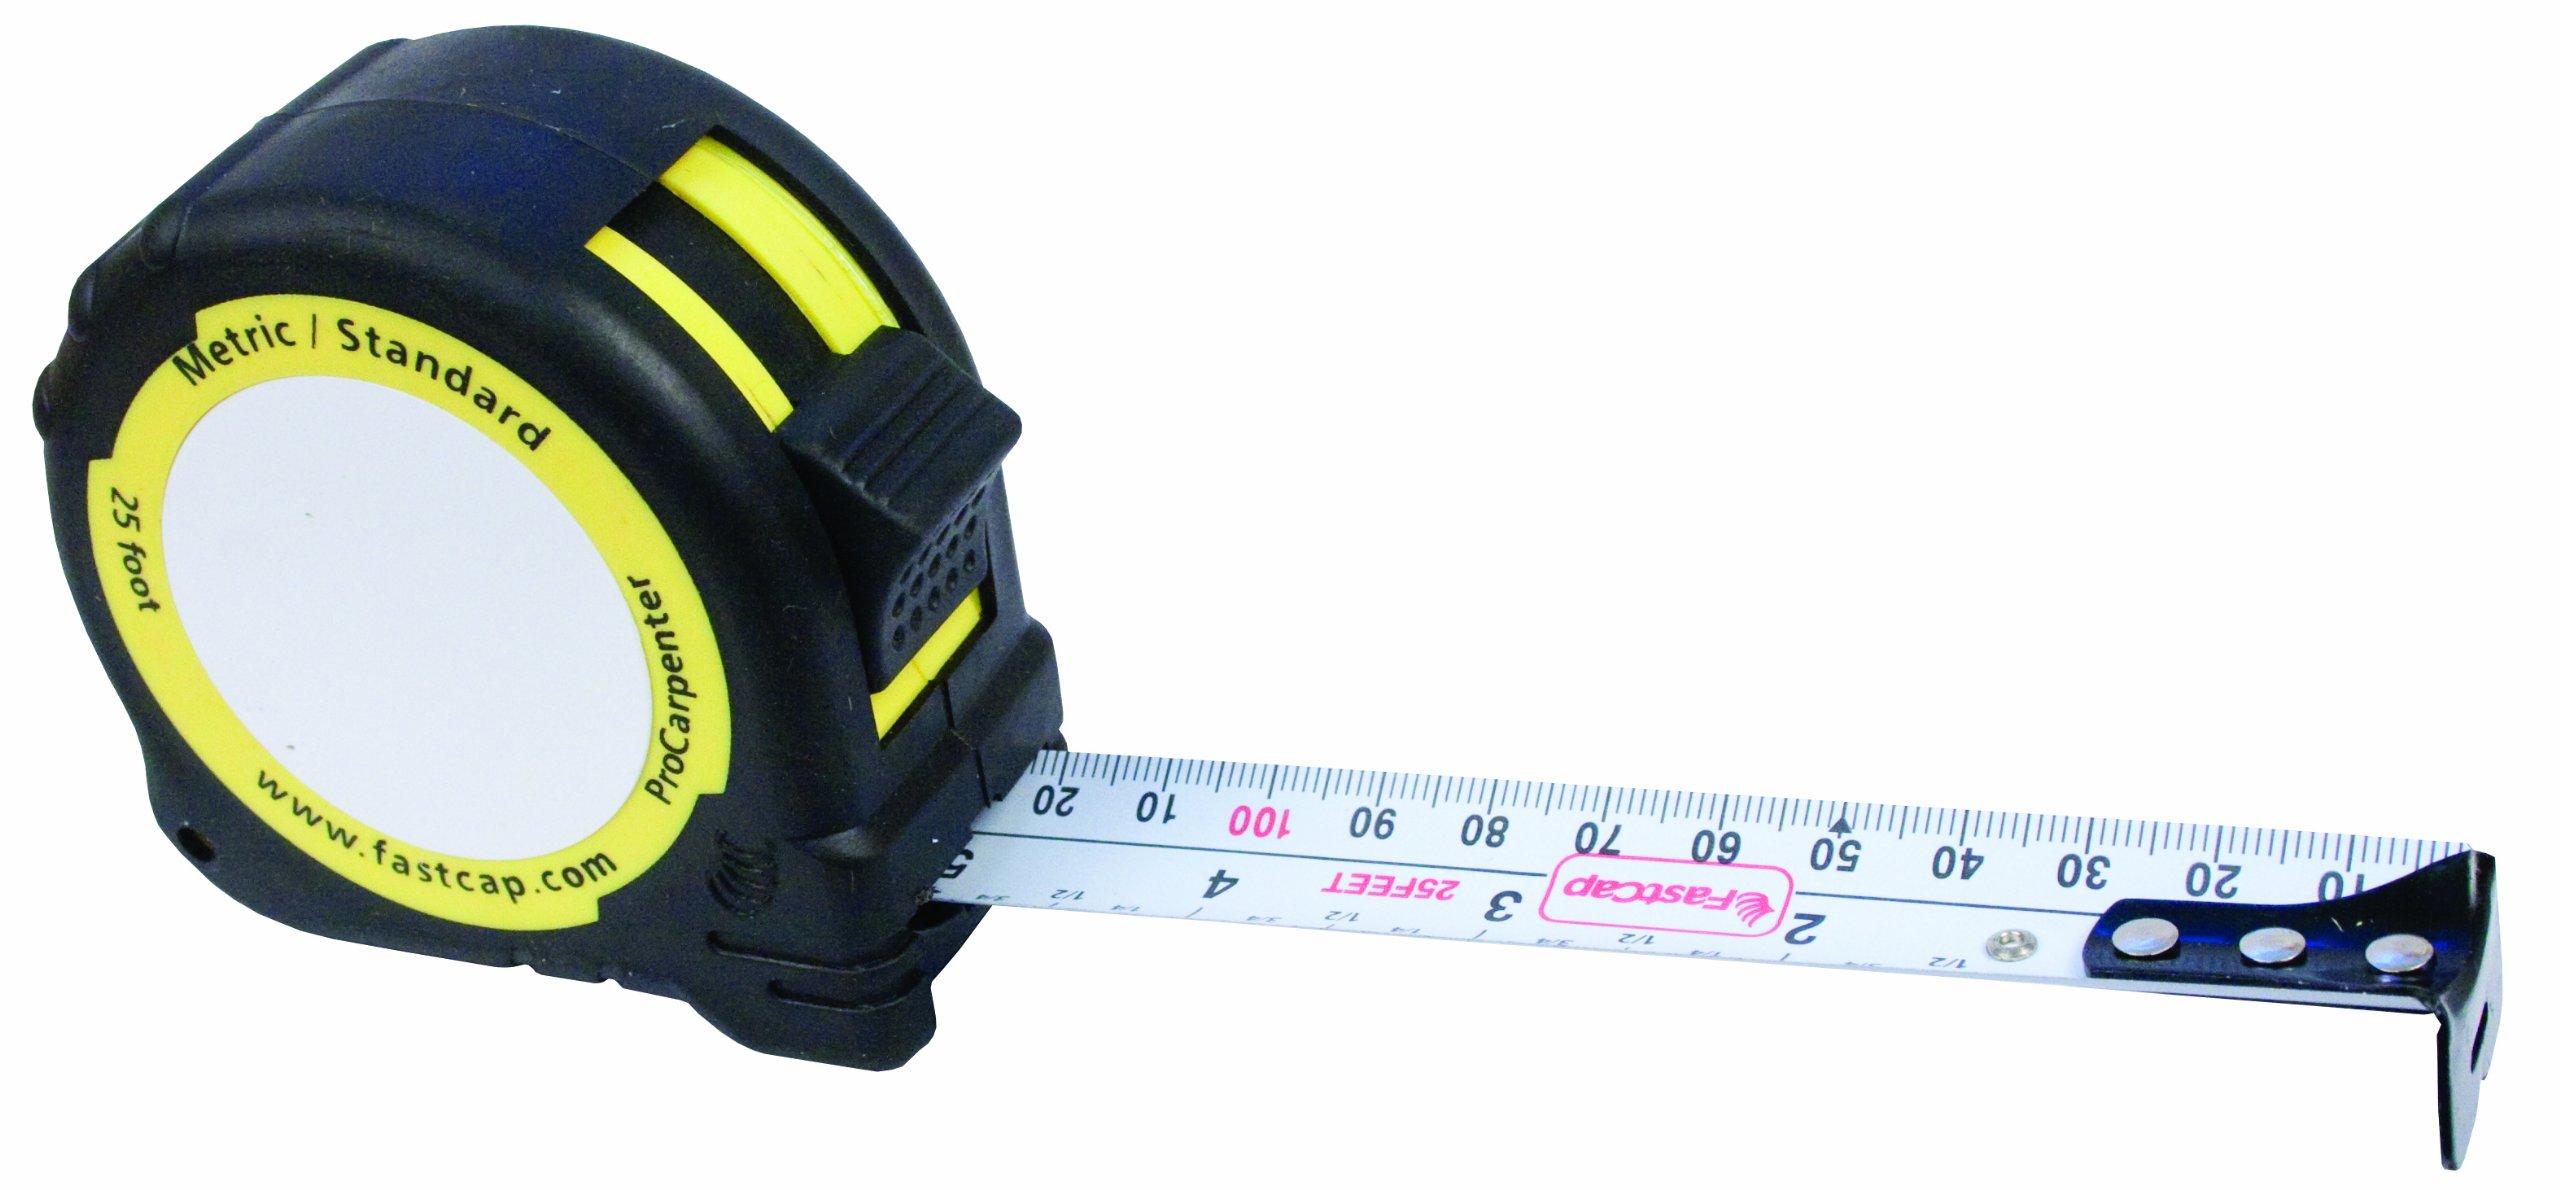 78 On Tape Measure: Linear Measurement ⇒ LaserJamb ProCarpenter PMS25 Pad